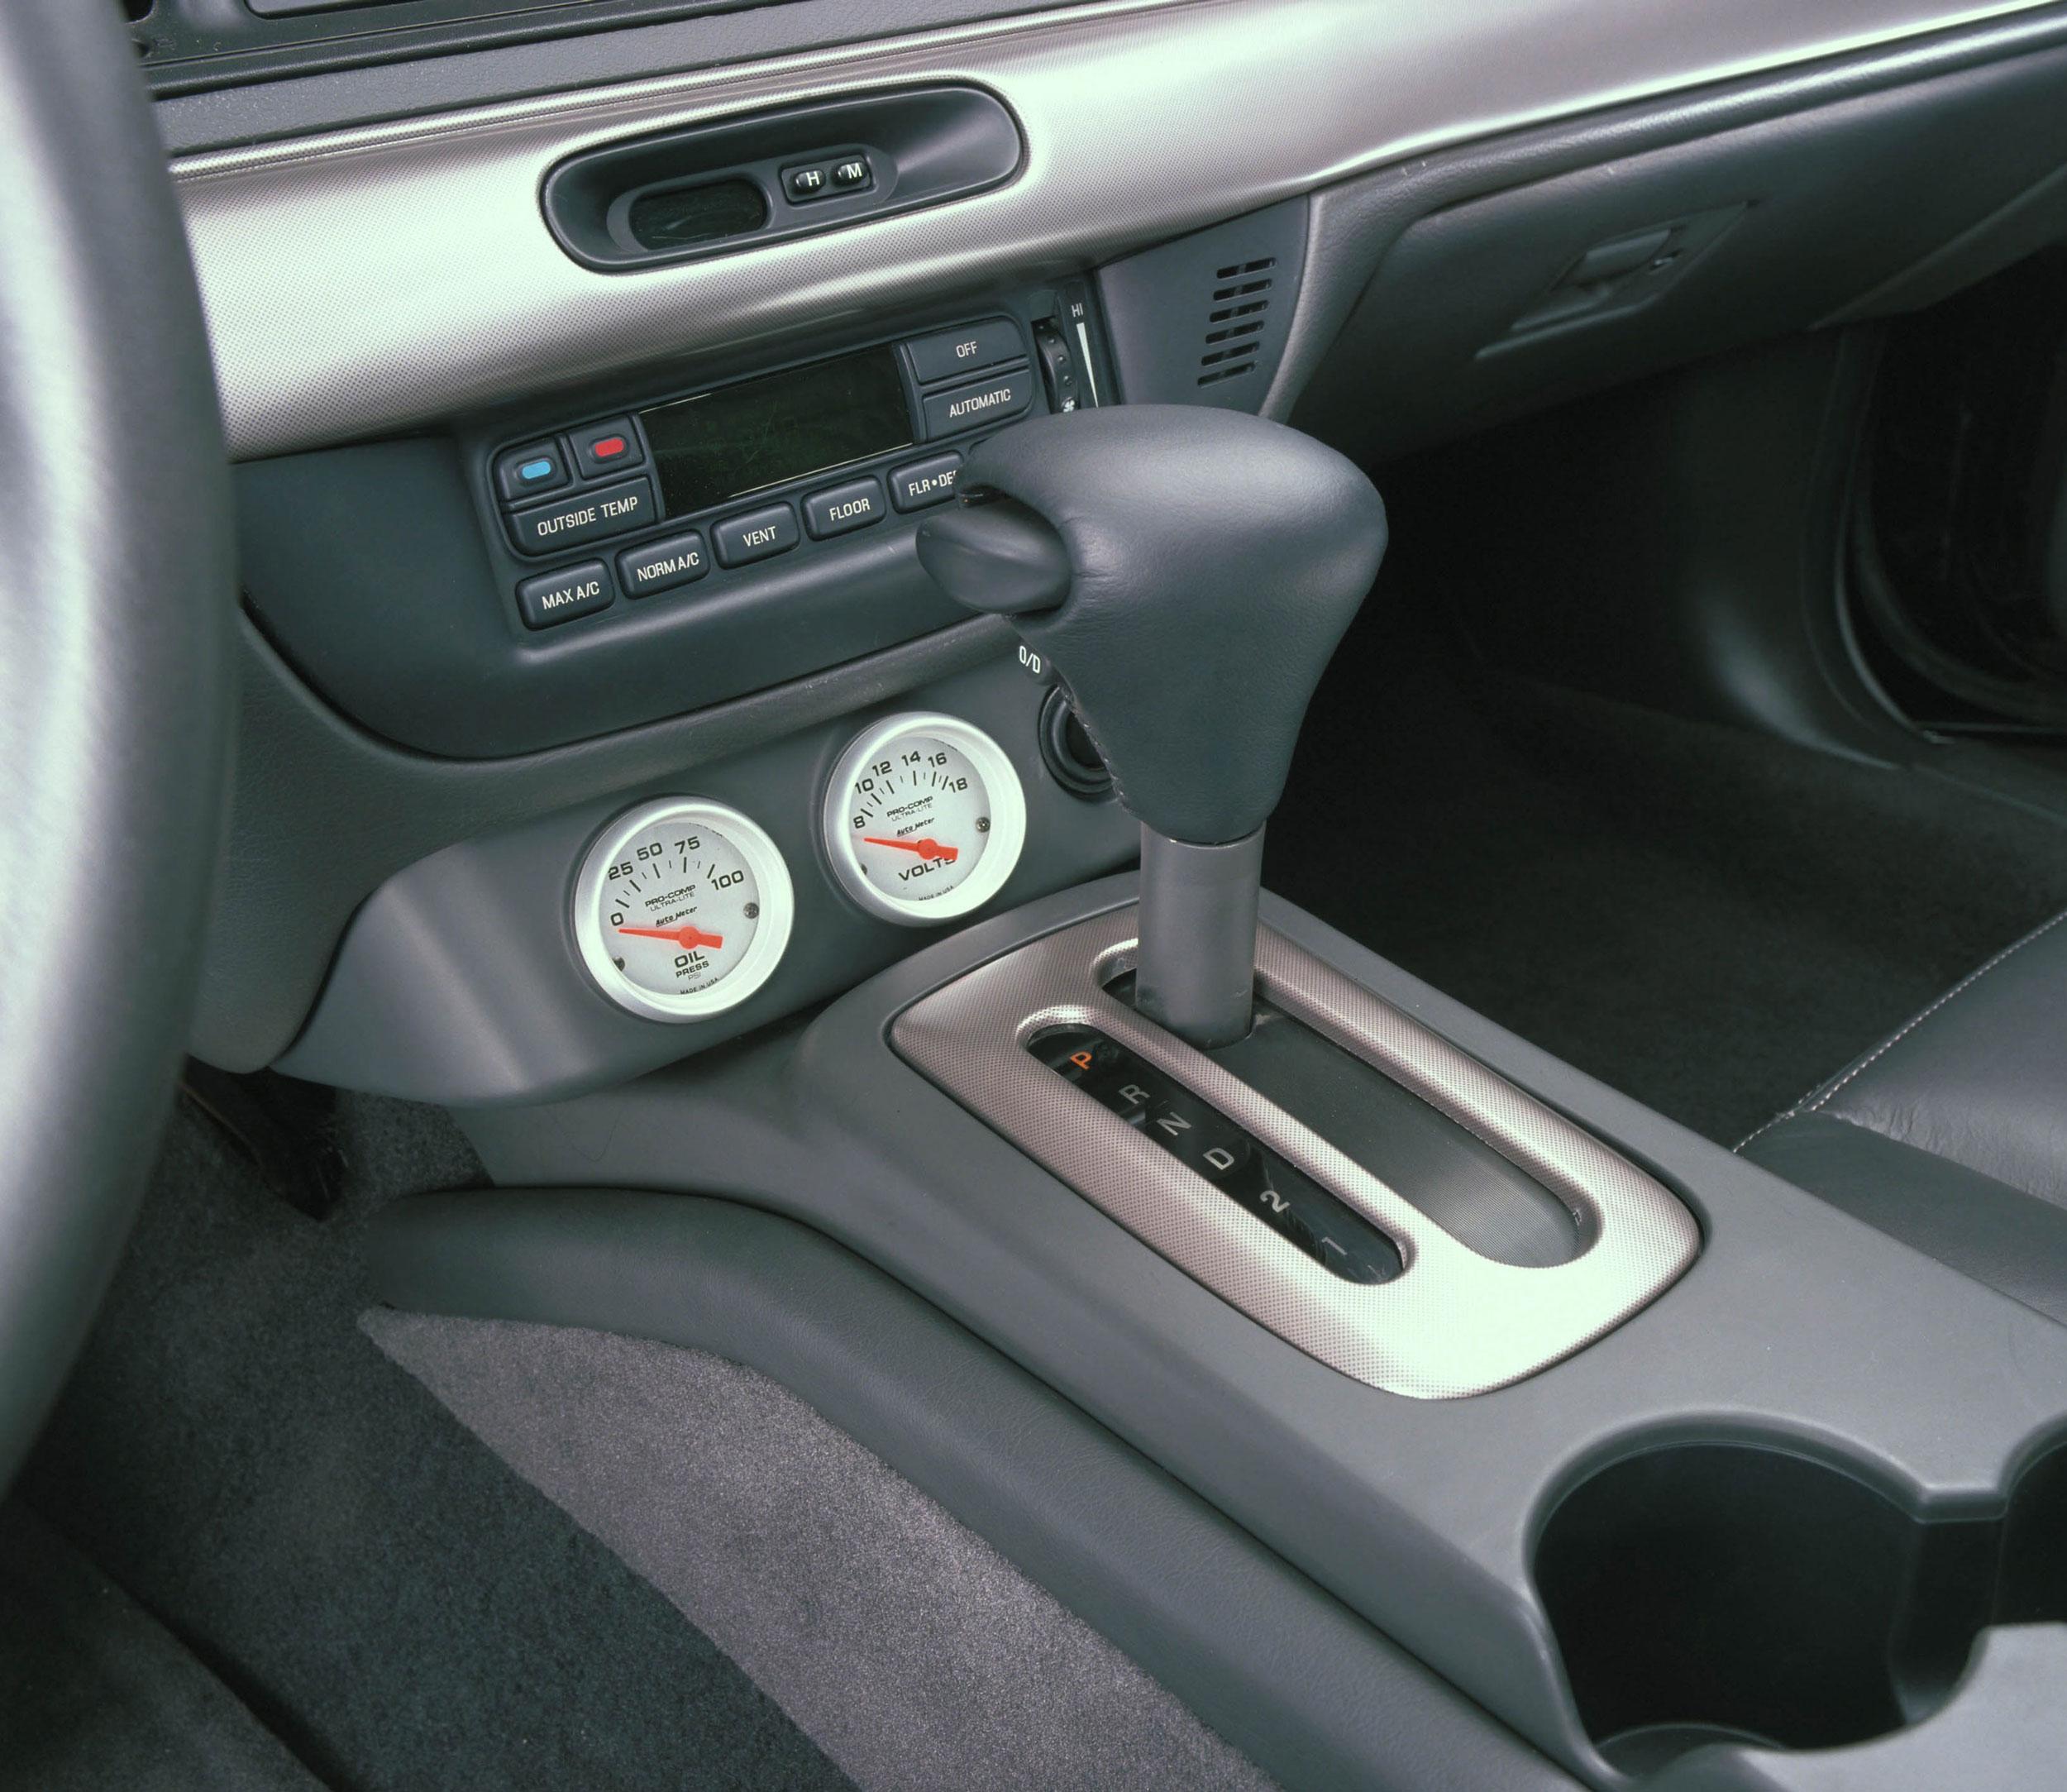 2004 Mercury Marauder shifter knob